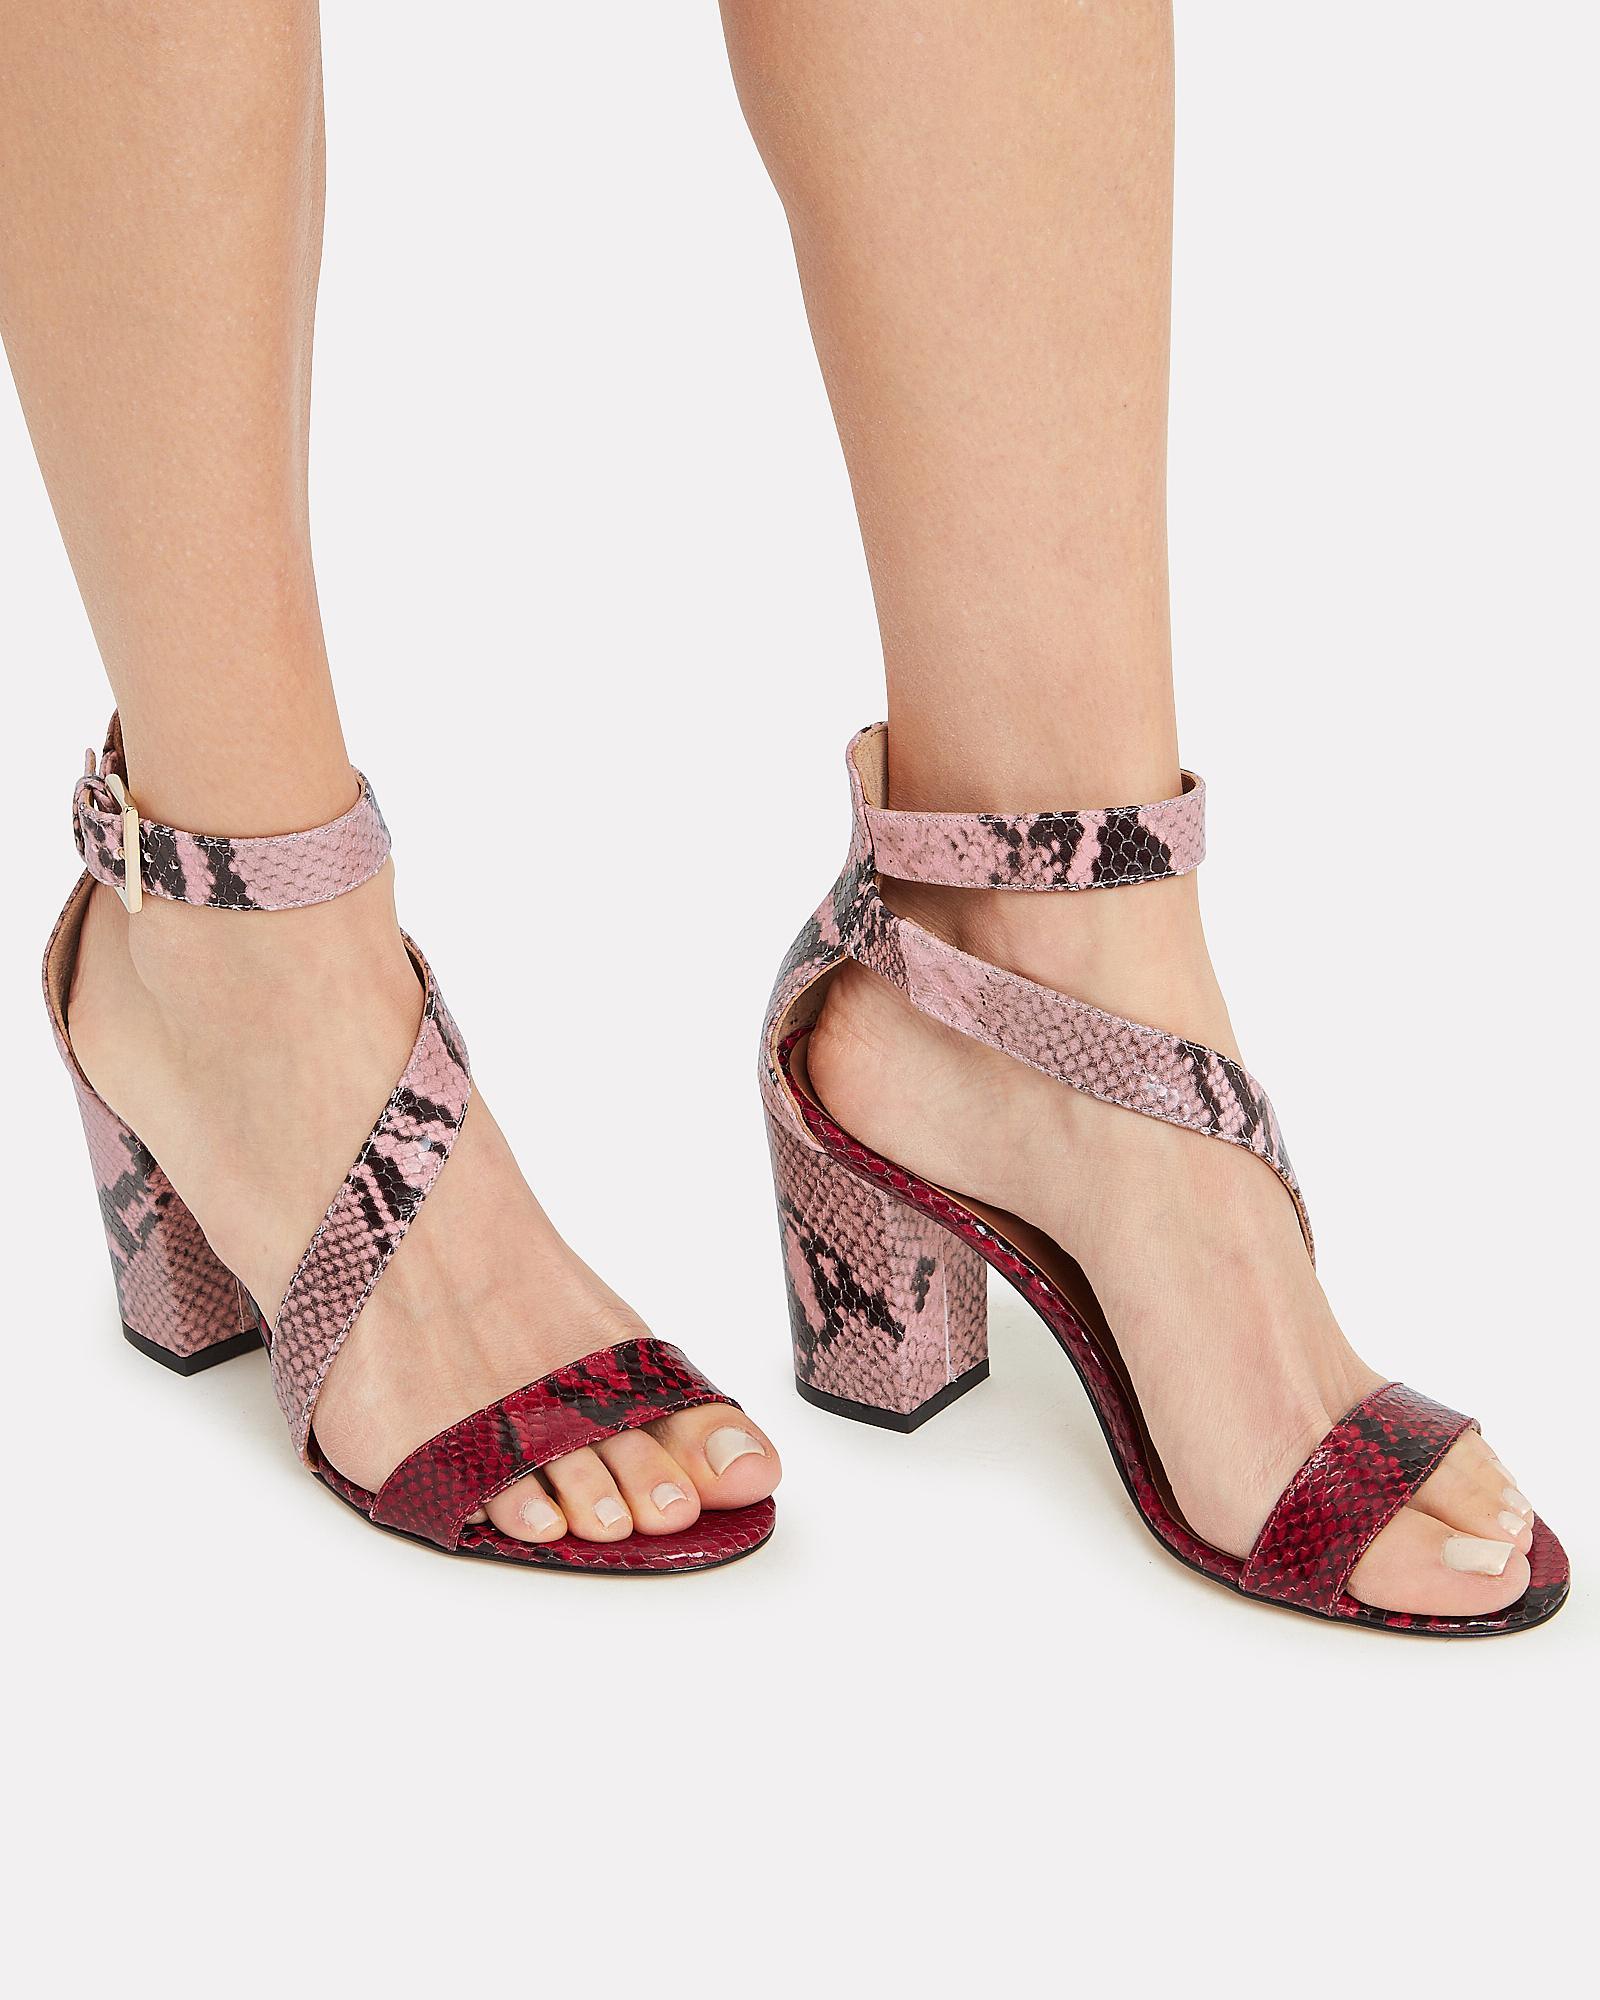 ffbecfd2ab7 Paris Texas Snakeskin Embossed Sandals Red/pink 39 in Pink - Lyst